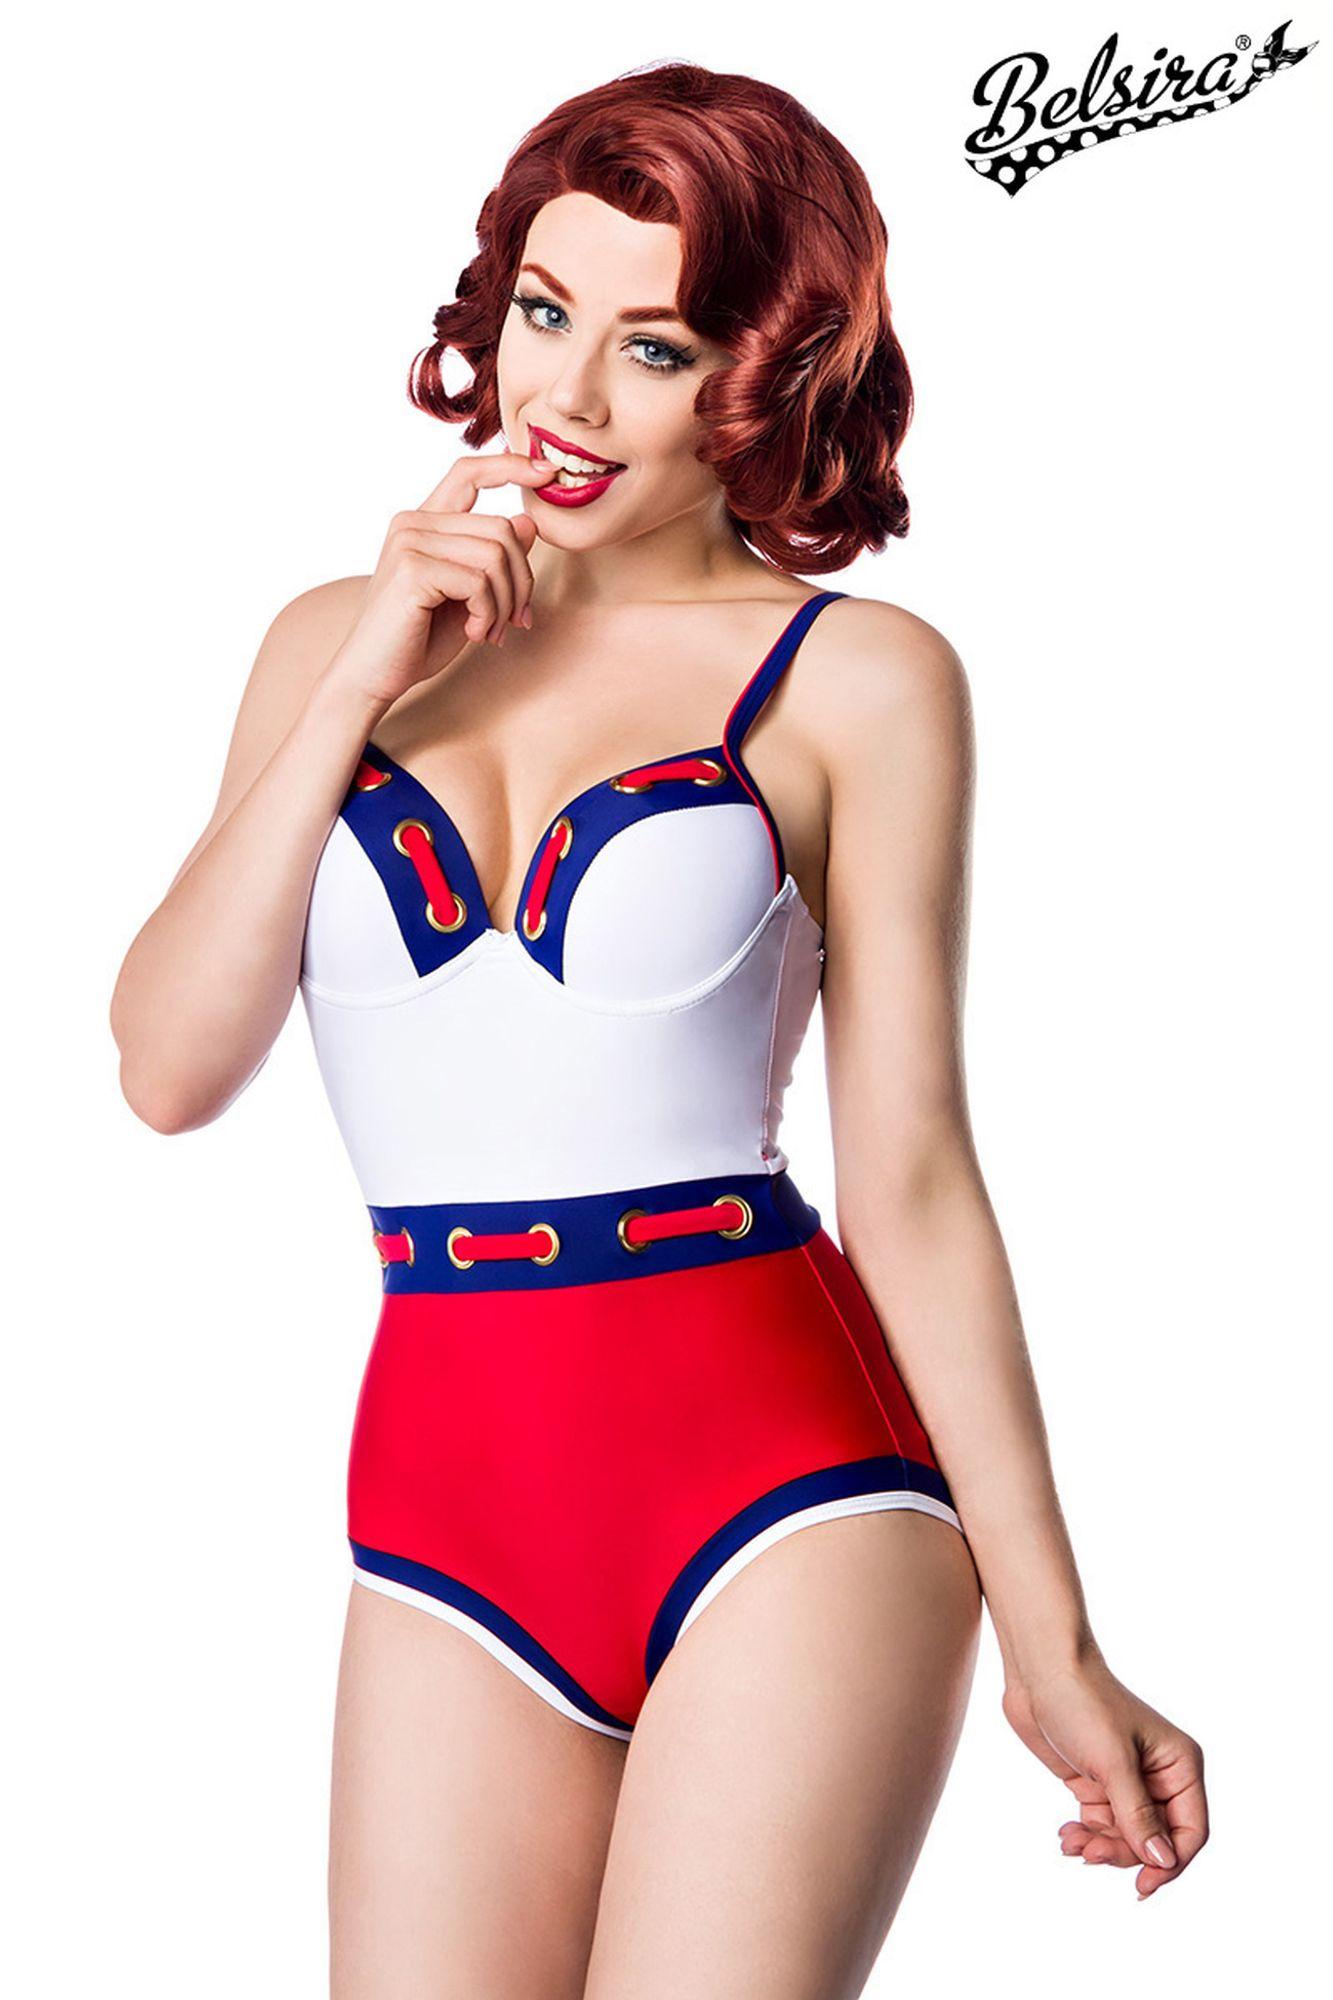 Belsira Marine Swimsuit - weiß/blau/rot